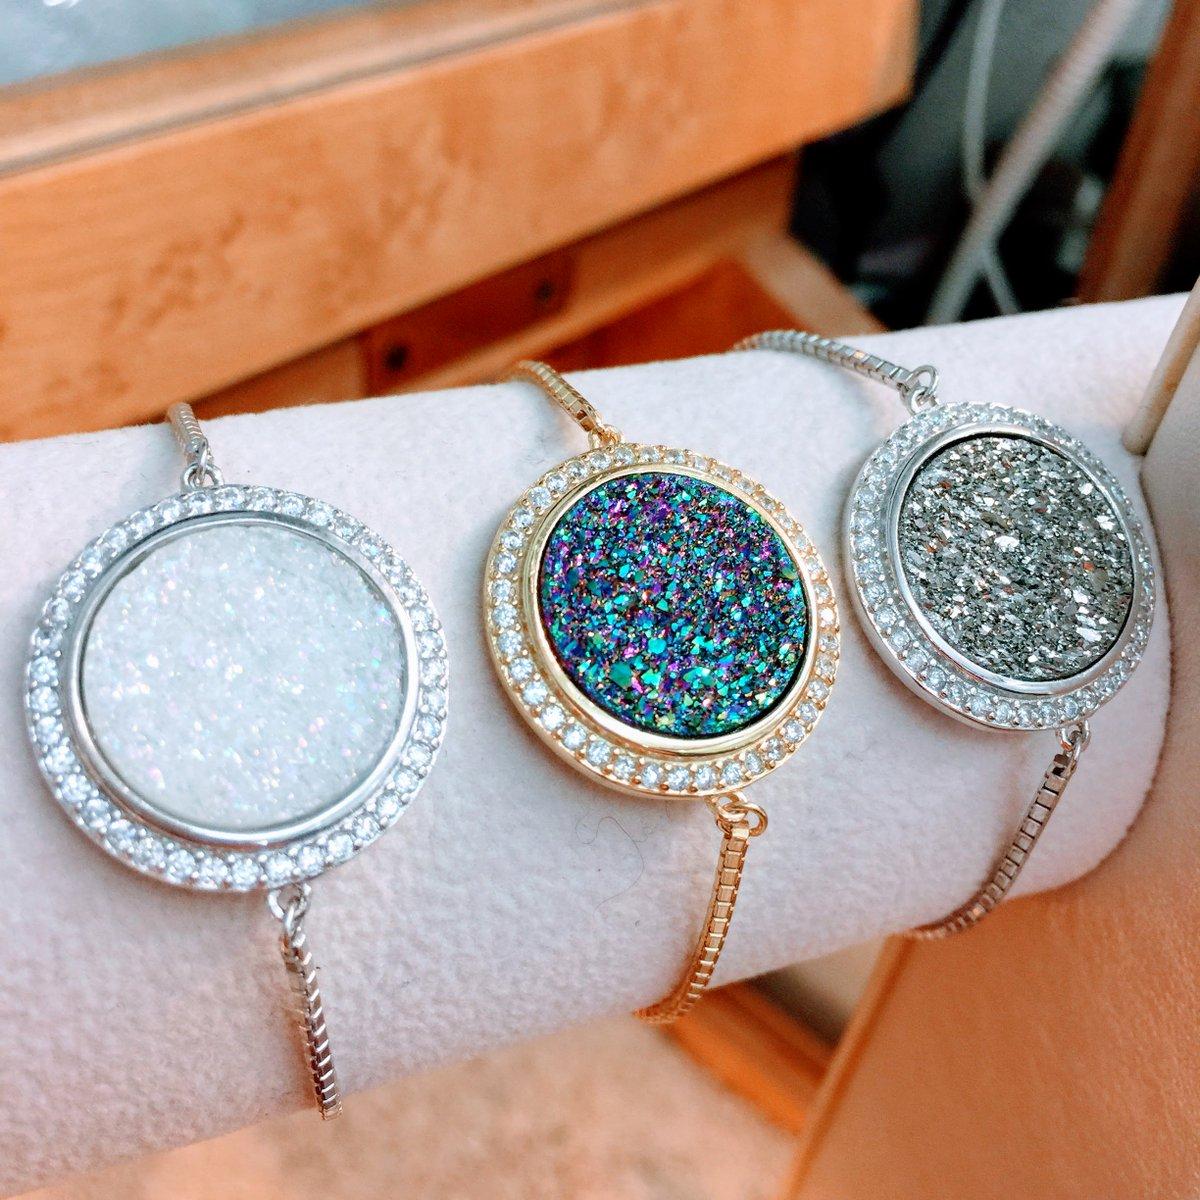 Key West Local Luxe On Twitter Jewelry Keywest Shopping